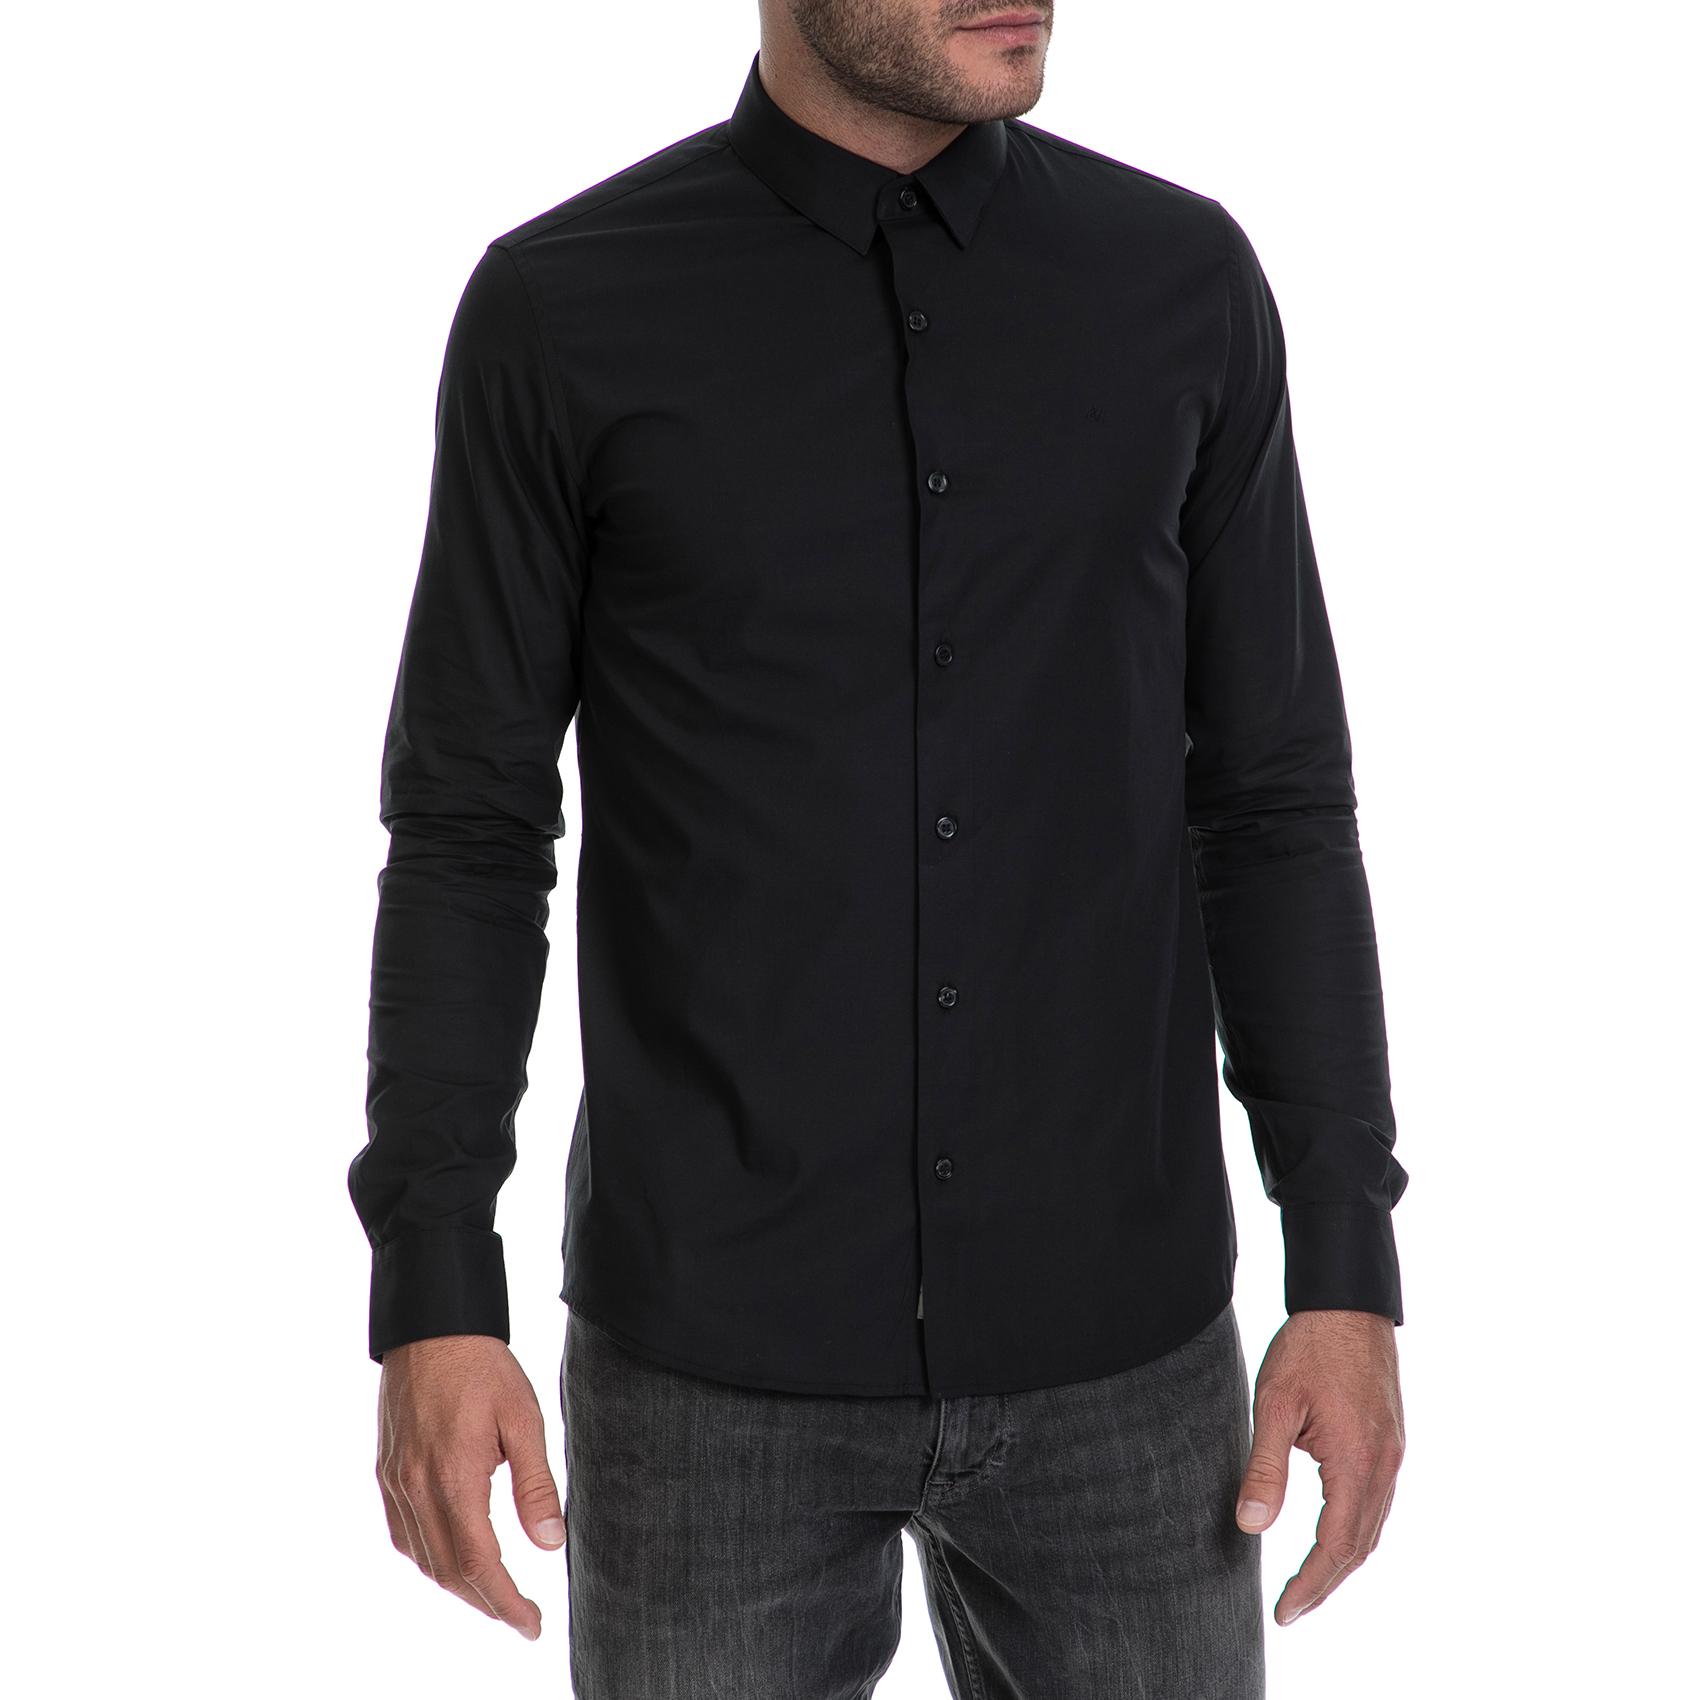 CALVIN KLEIN JEANS – Ανδρικό πουκάμισο BARI SLIM FIT μαύρο